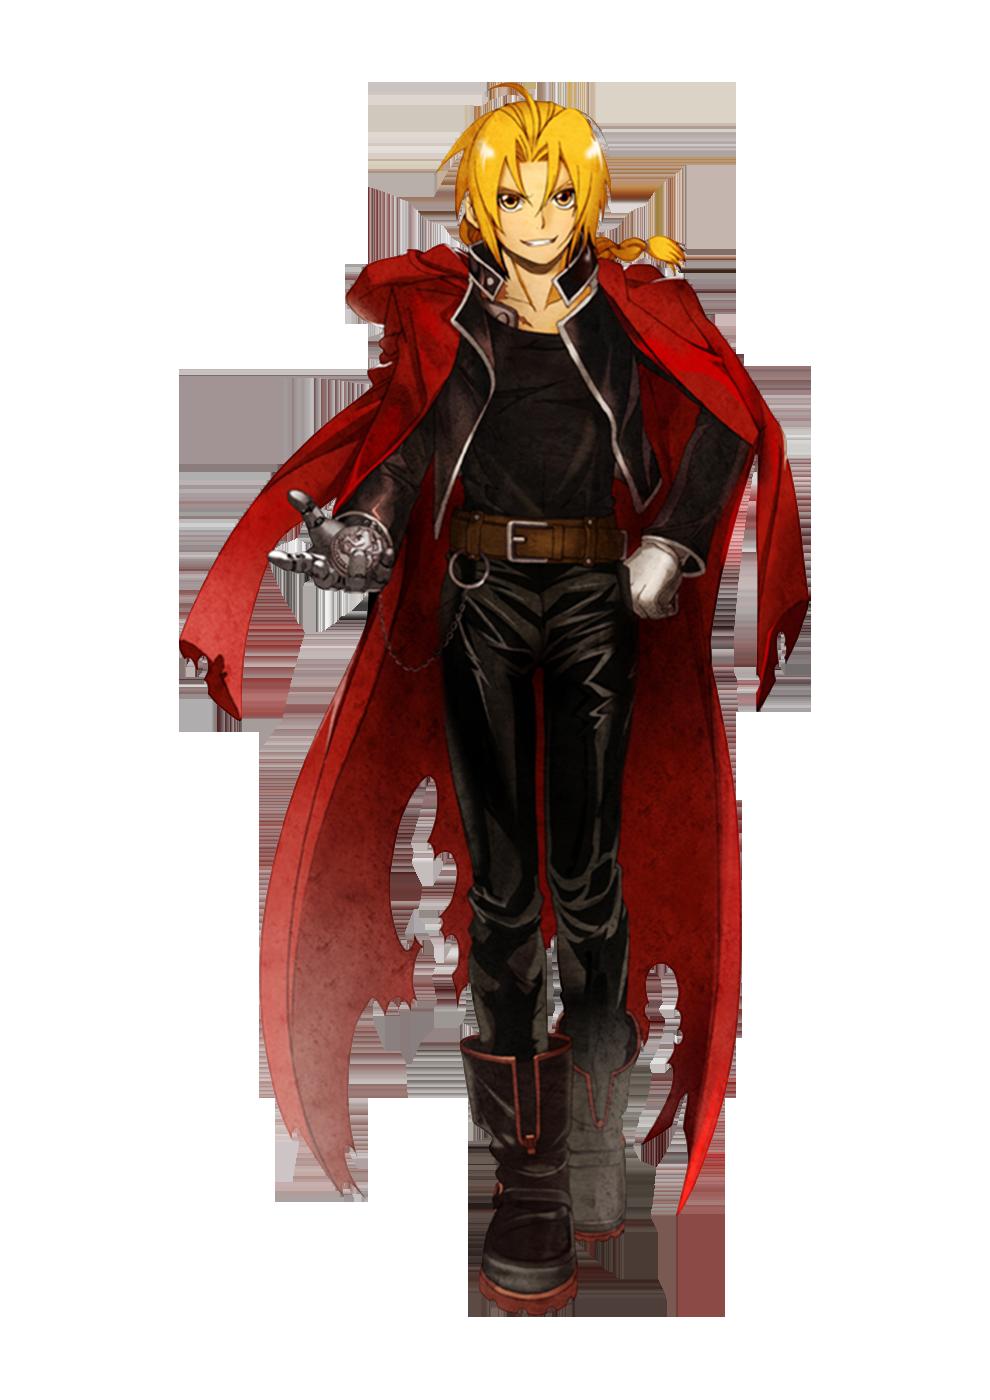 Edward Elric | Fullmetal alchemist, Fullmetal alchemist brotherhood, Alchemist